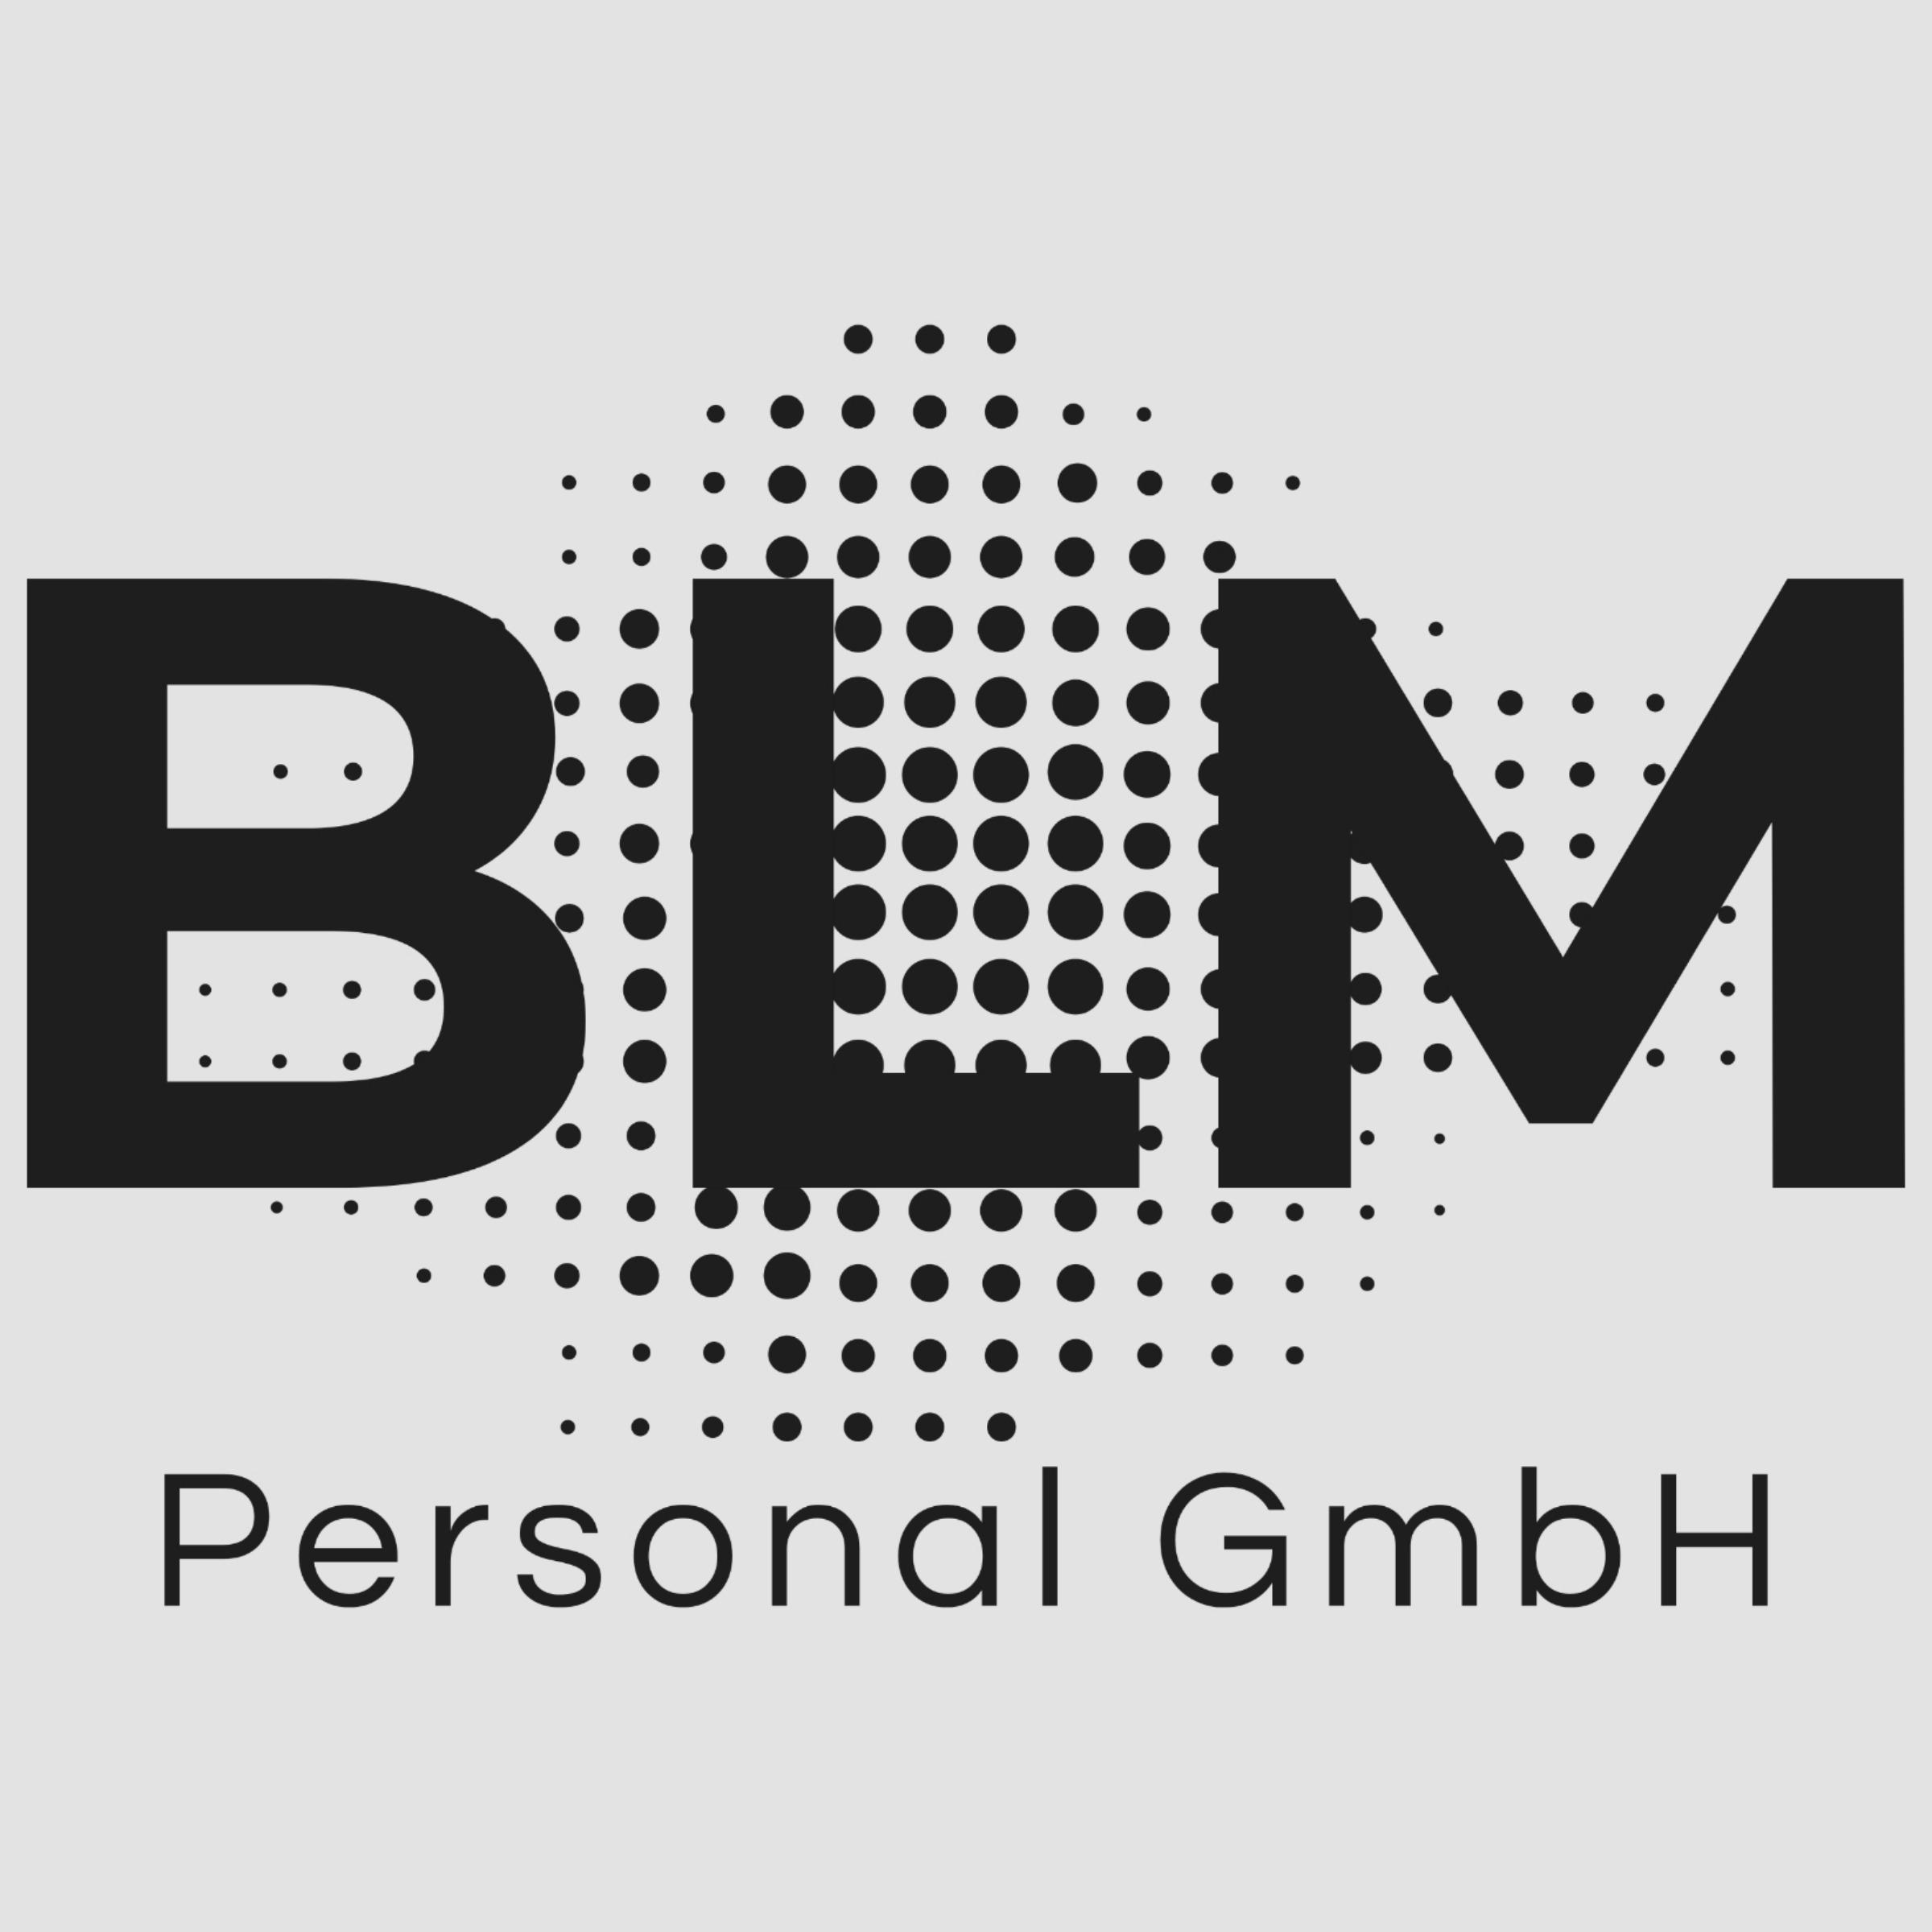 BLM-Personal GmbH